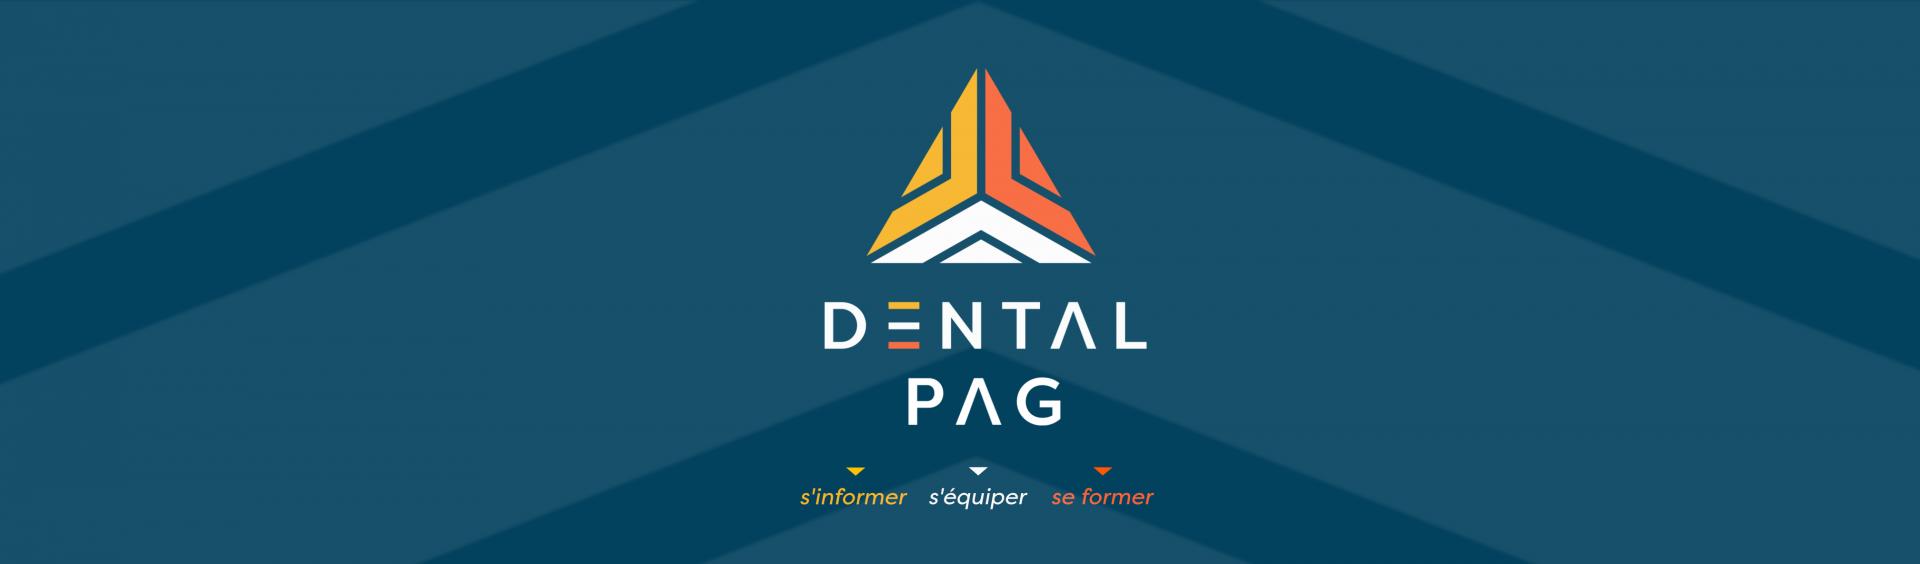 Dental PAG